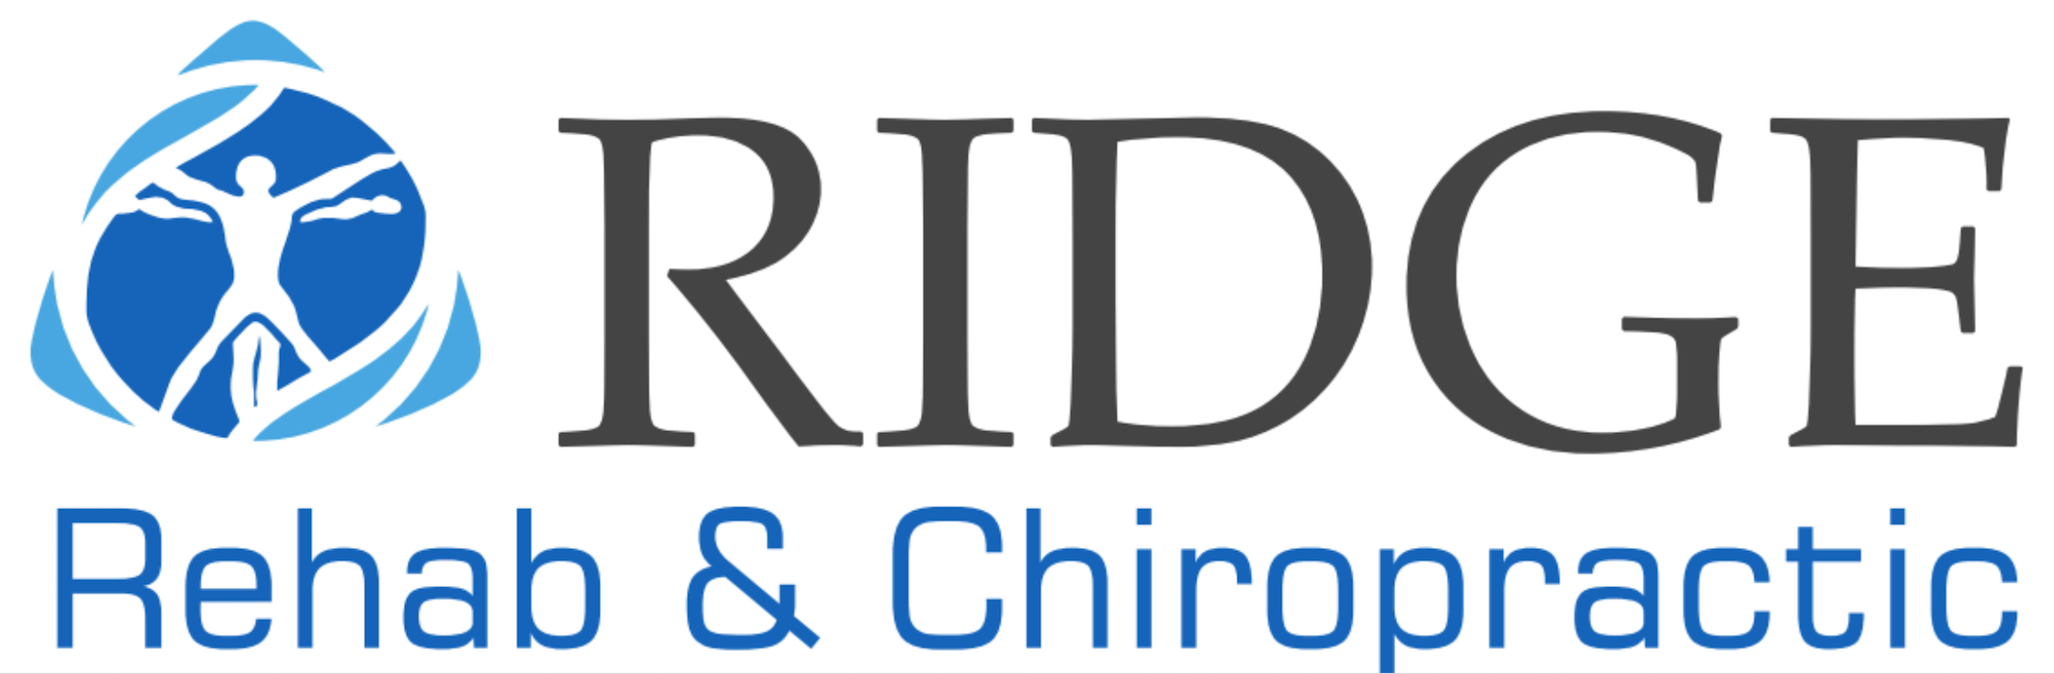 Park Ridge Chiropractor